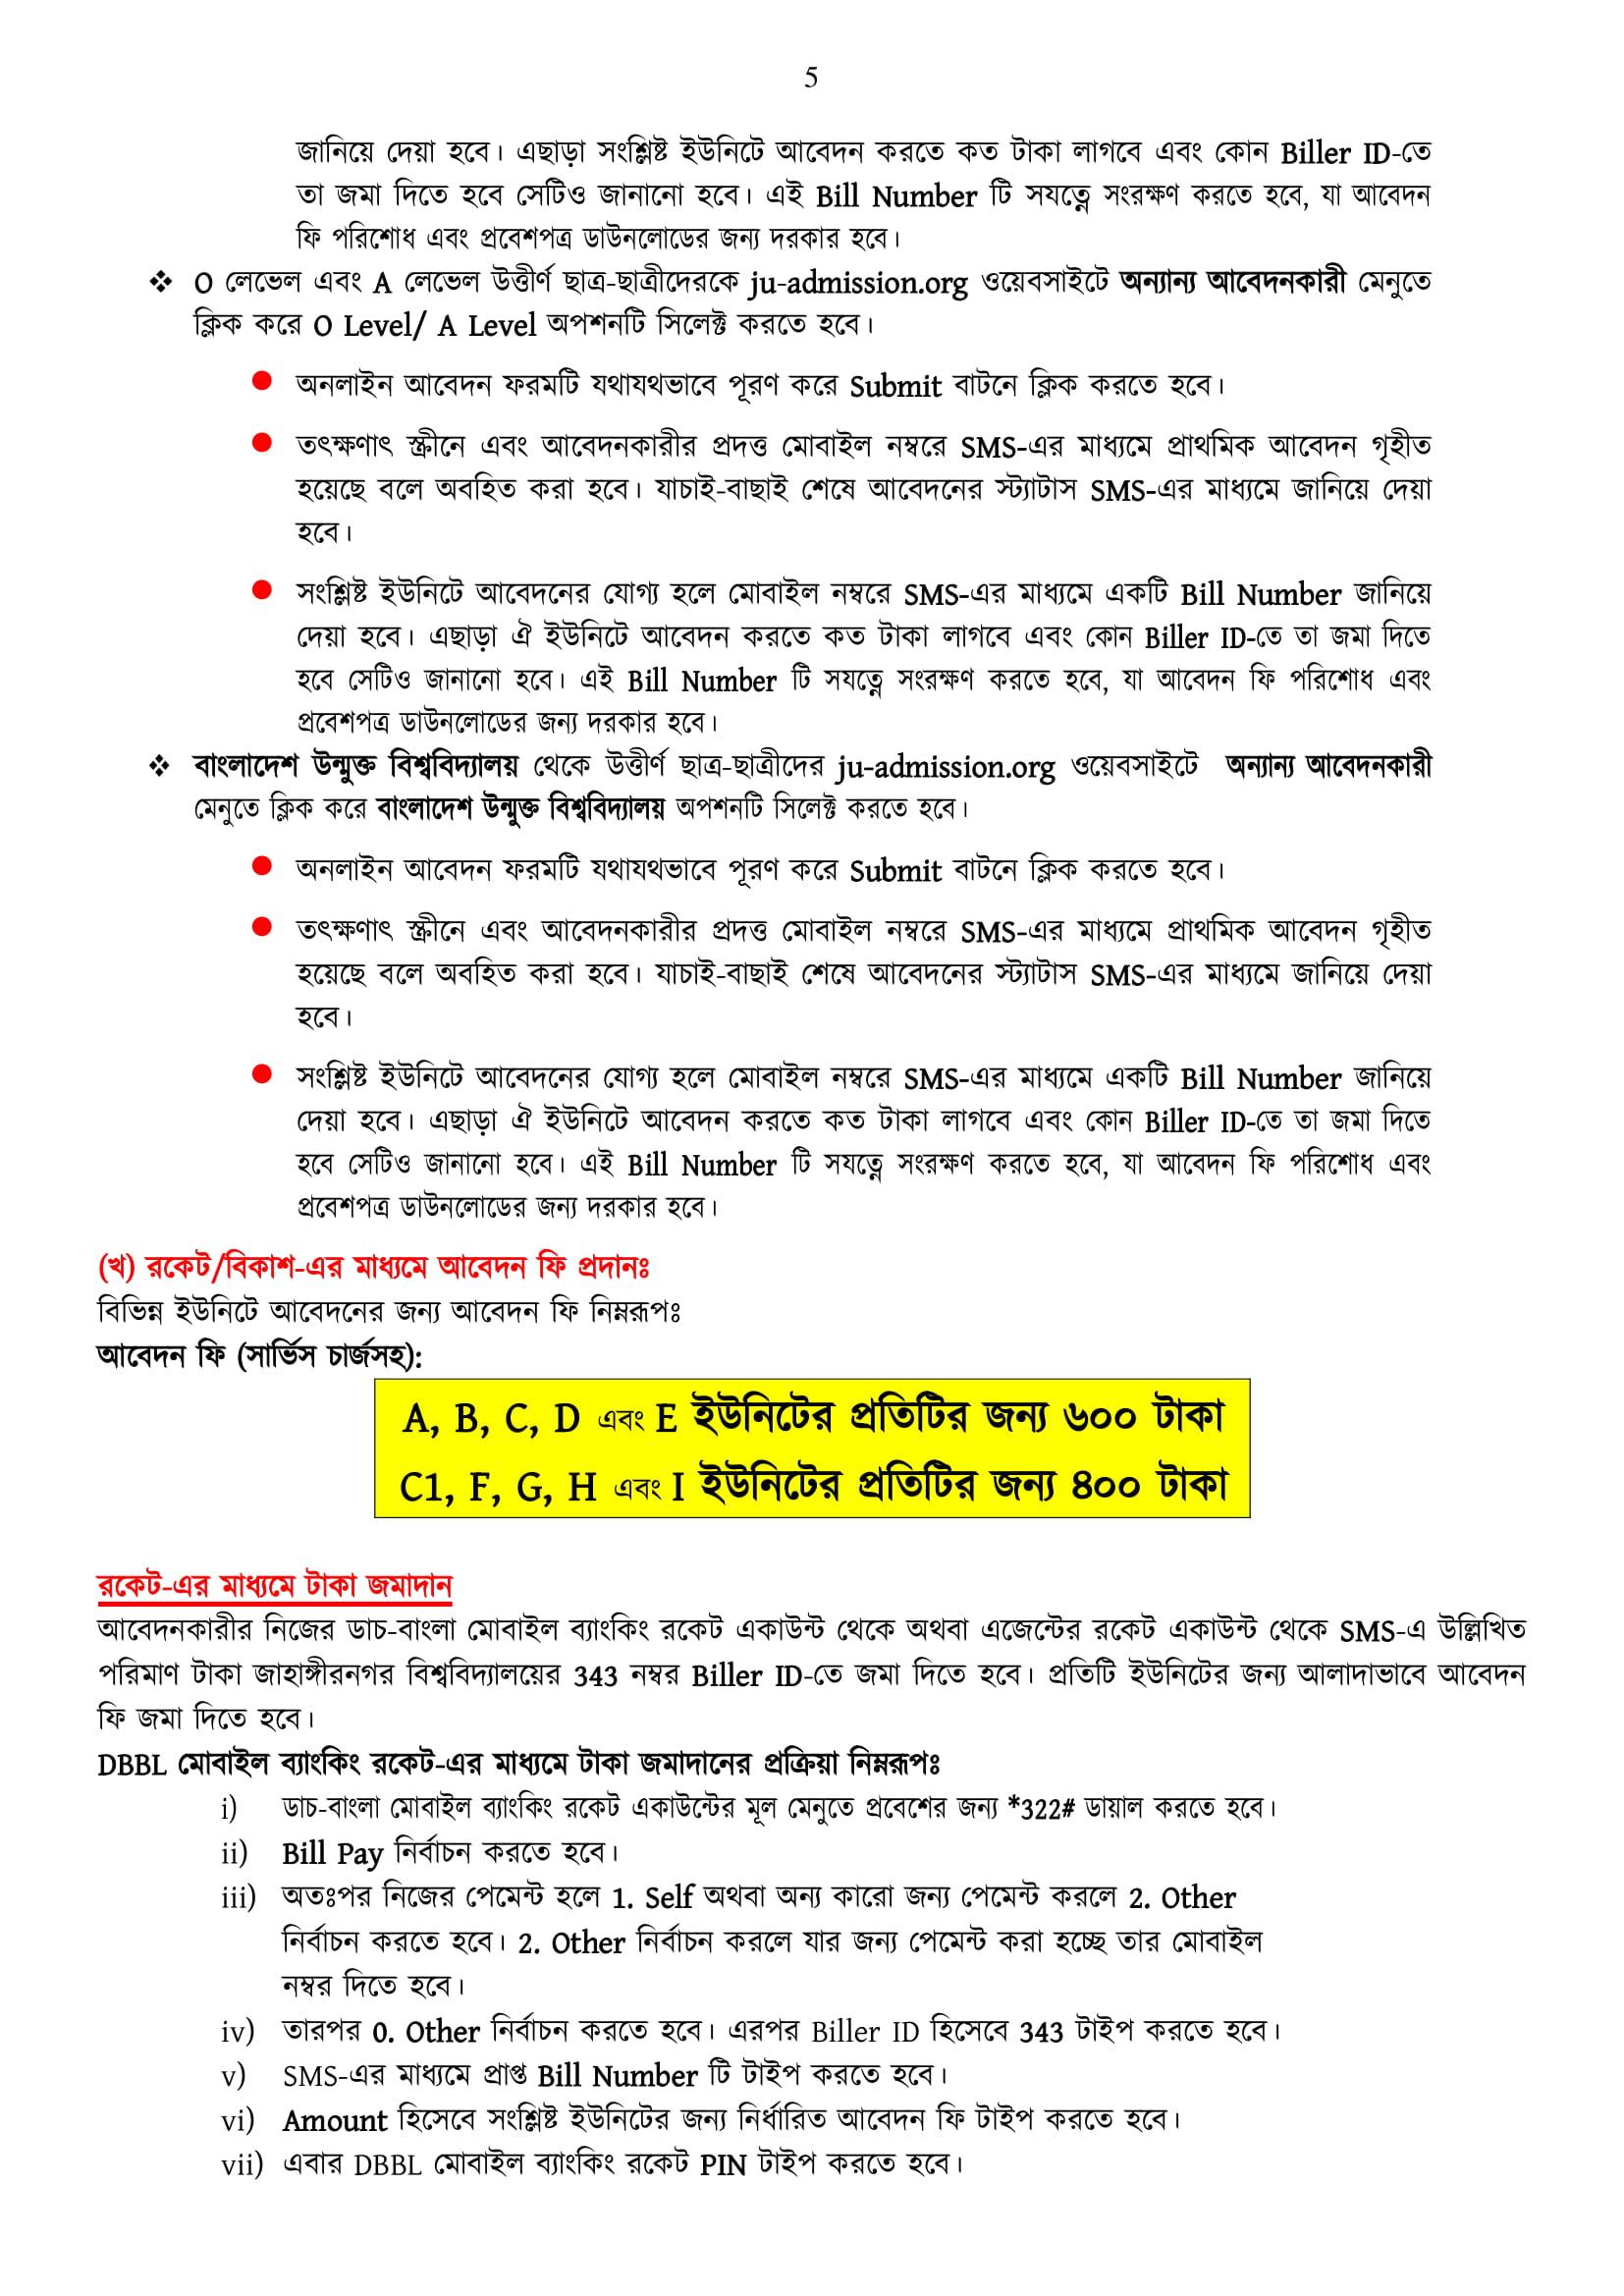 Jahangirnagar University Admission Circular 2020-21 5